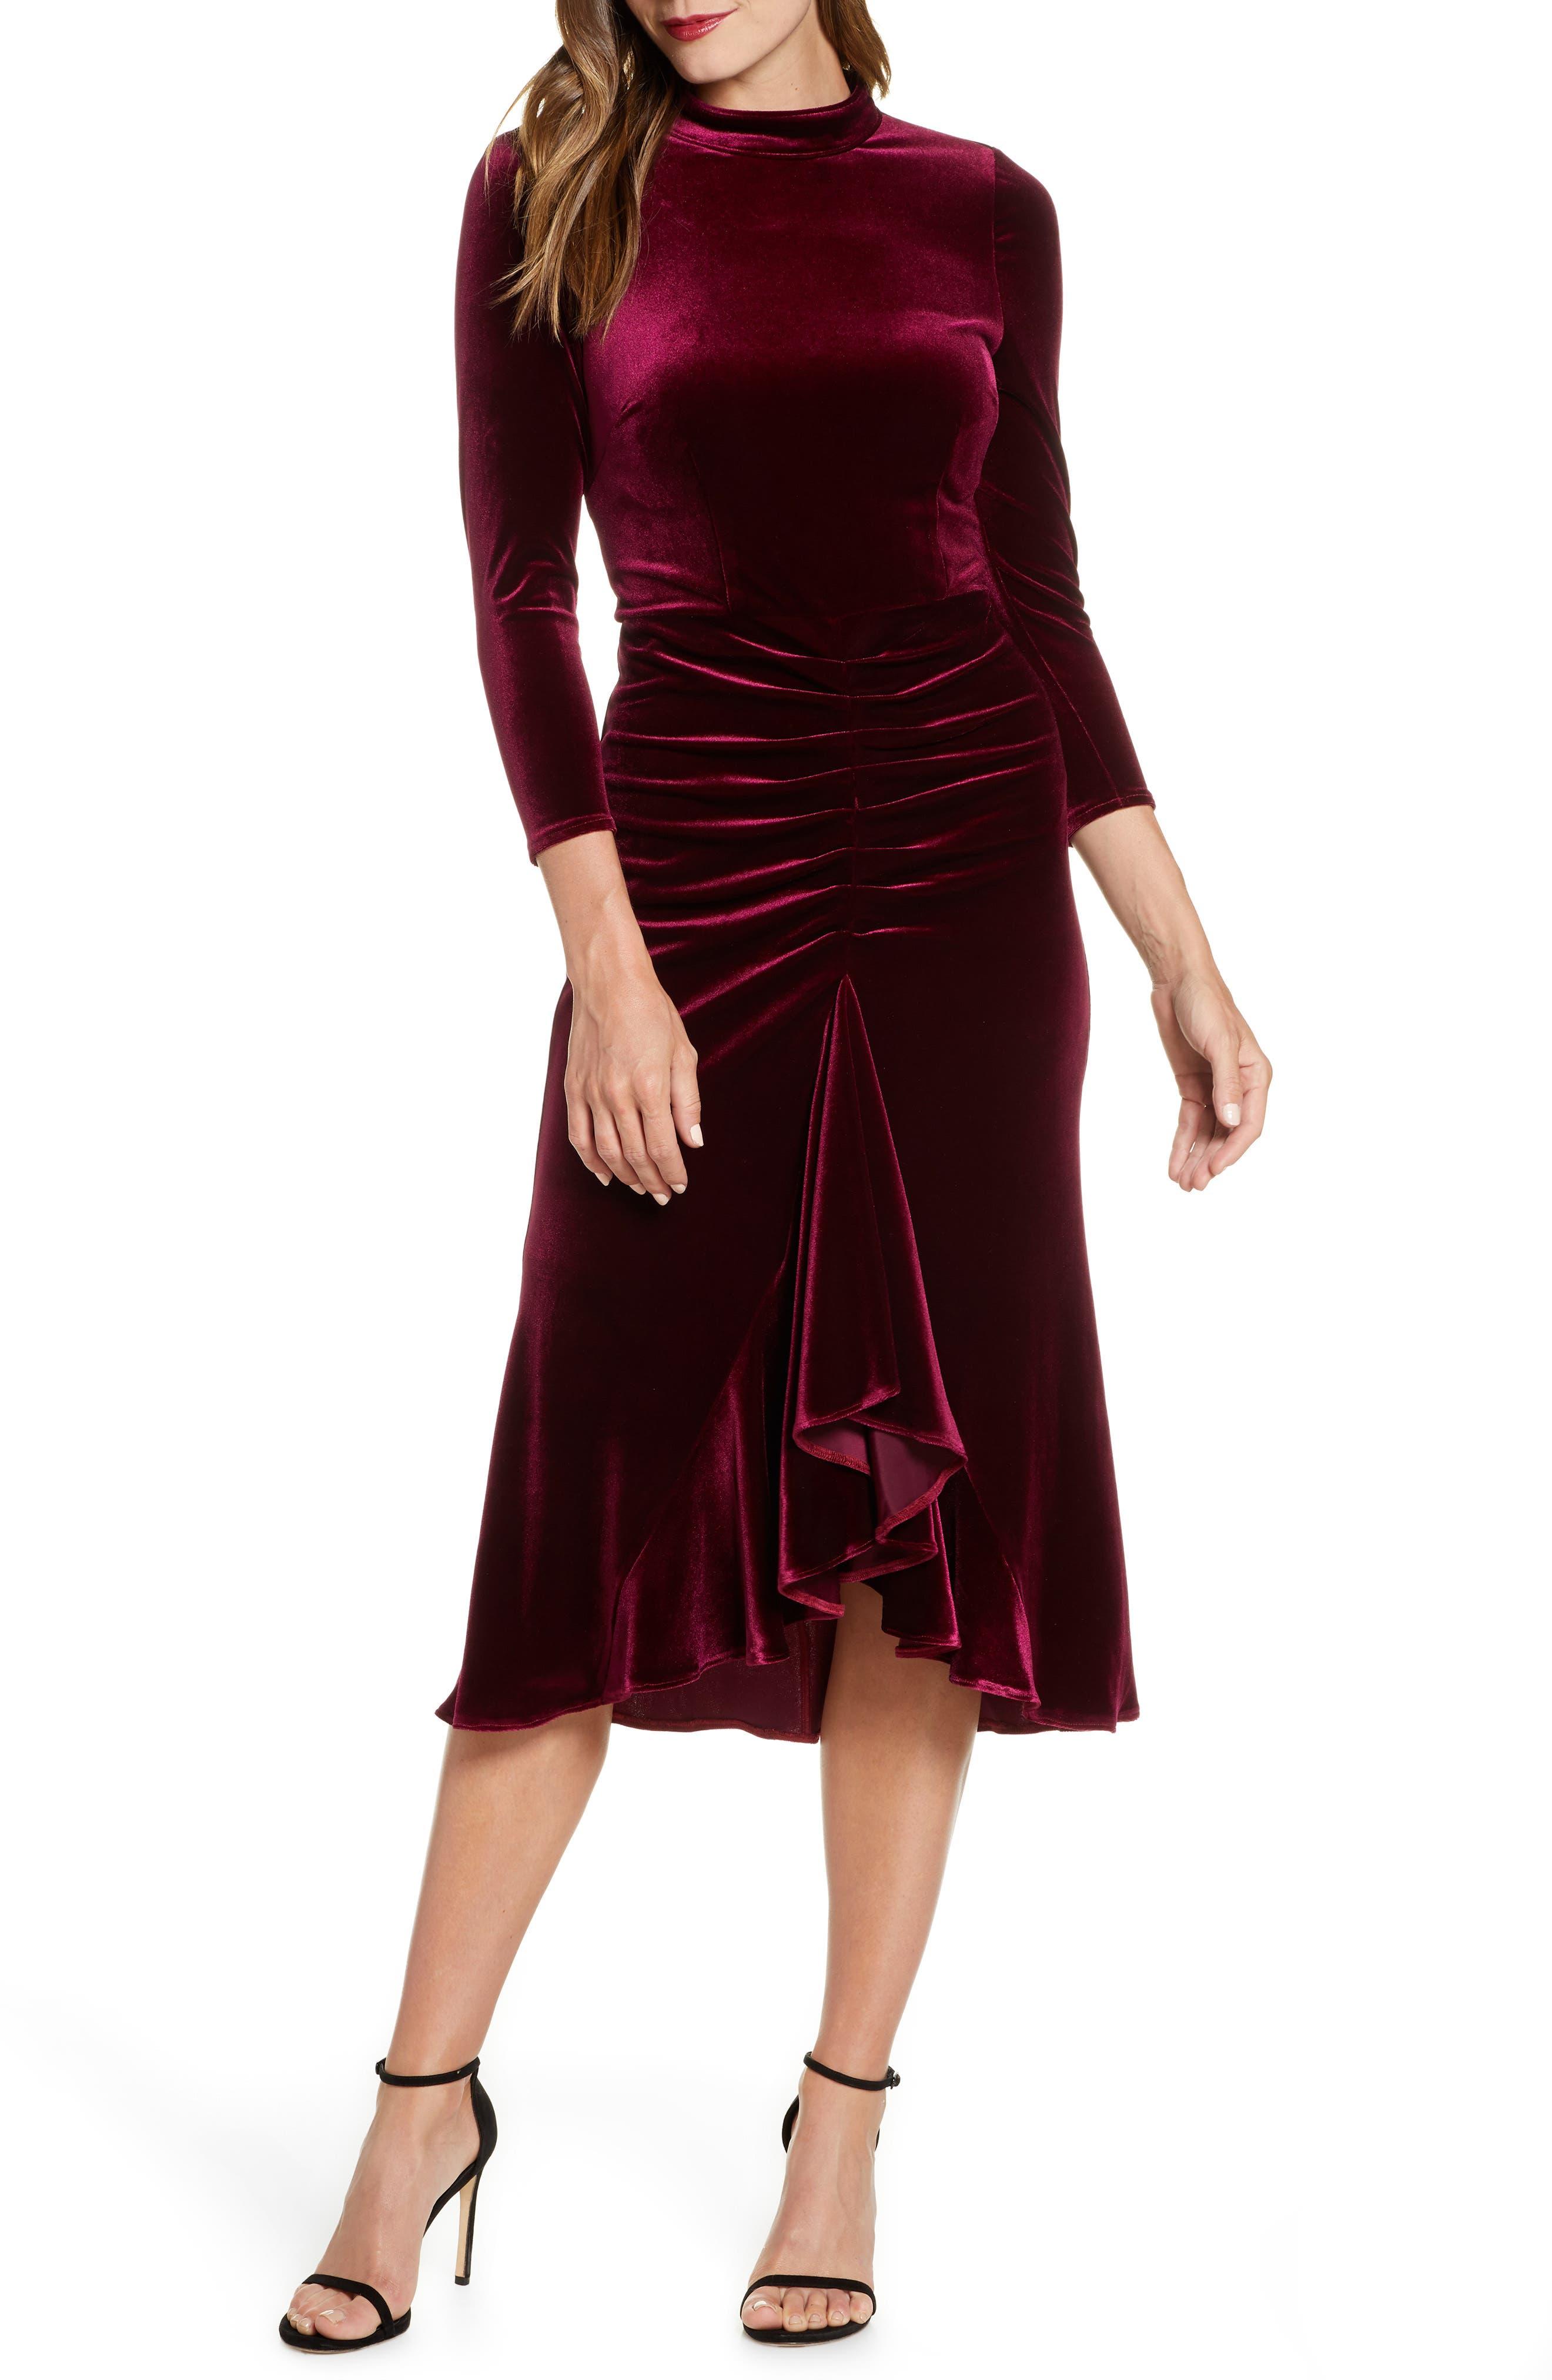 1930s Style Clothing and Fashion Womens Eliza J Ruched Velvet Dress $103.60 AT vintagedancer.com